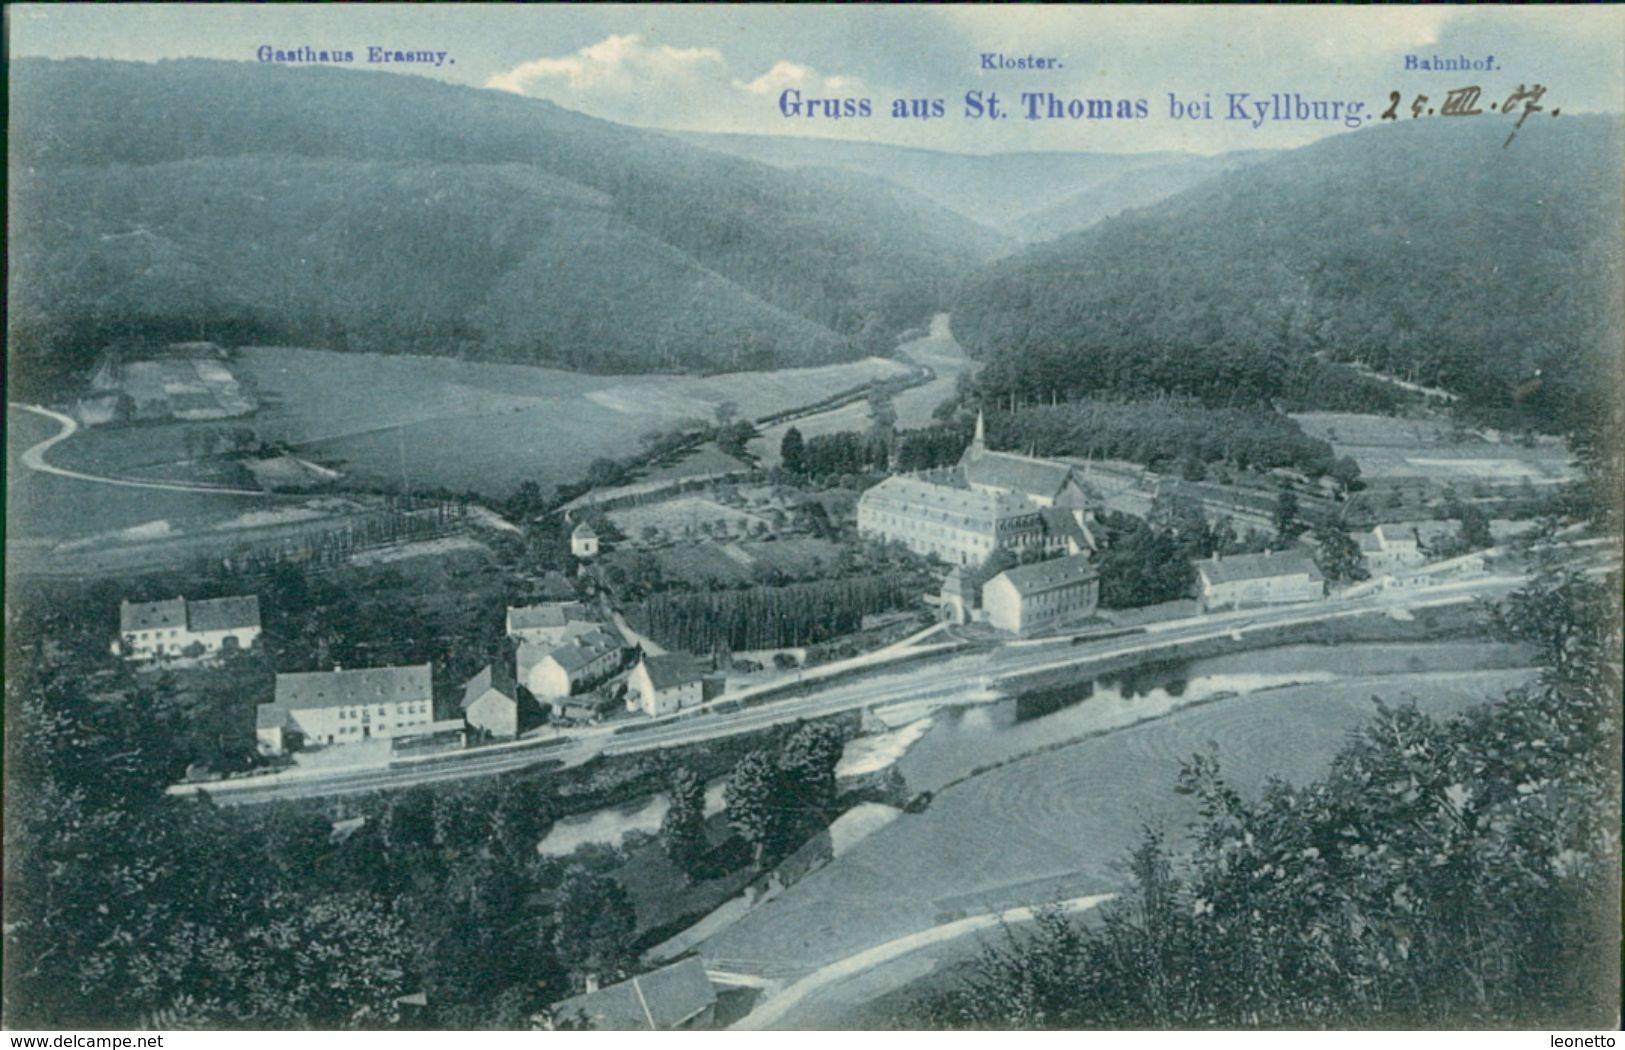 AK St. Thomas Bei Kyllburg Eifel, Gasthaus Erasmy, Kloster, Bahnhof, Um 1907 (29461) - Germany